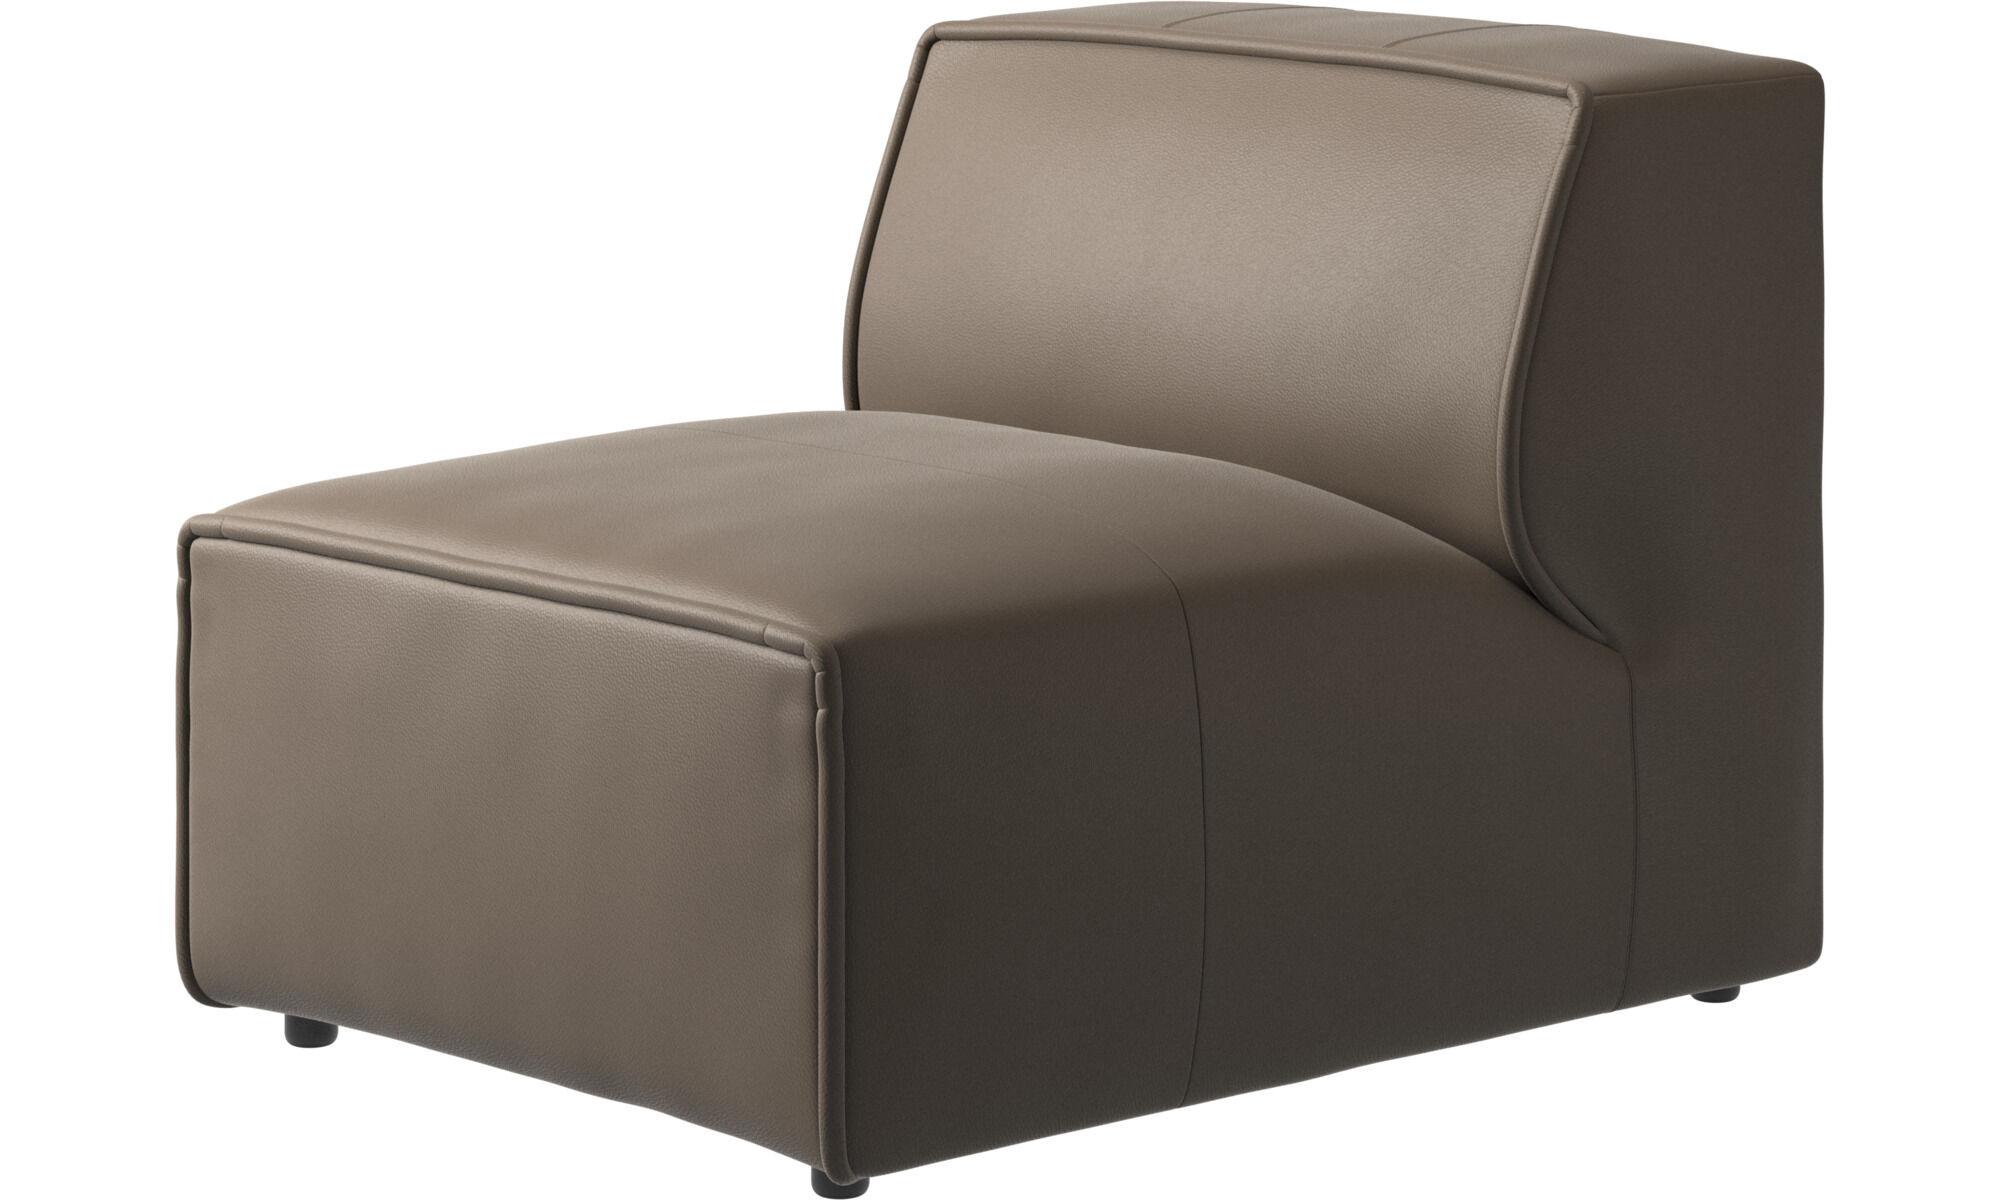 Modulare Sofas   Carmo Sessel /Basismodul   Grau   Leder